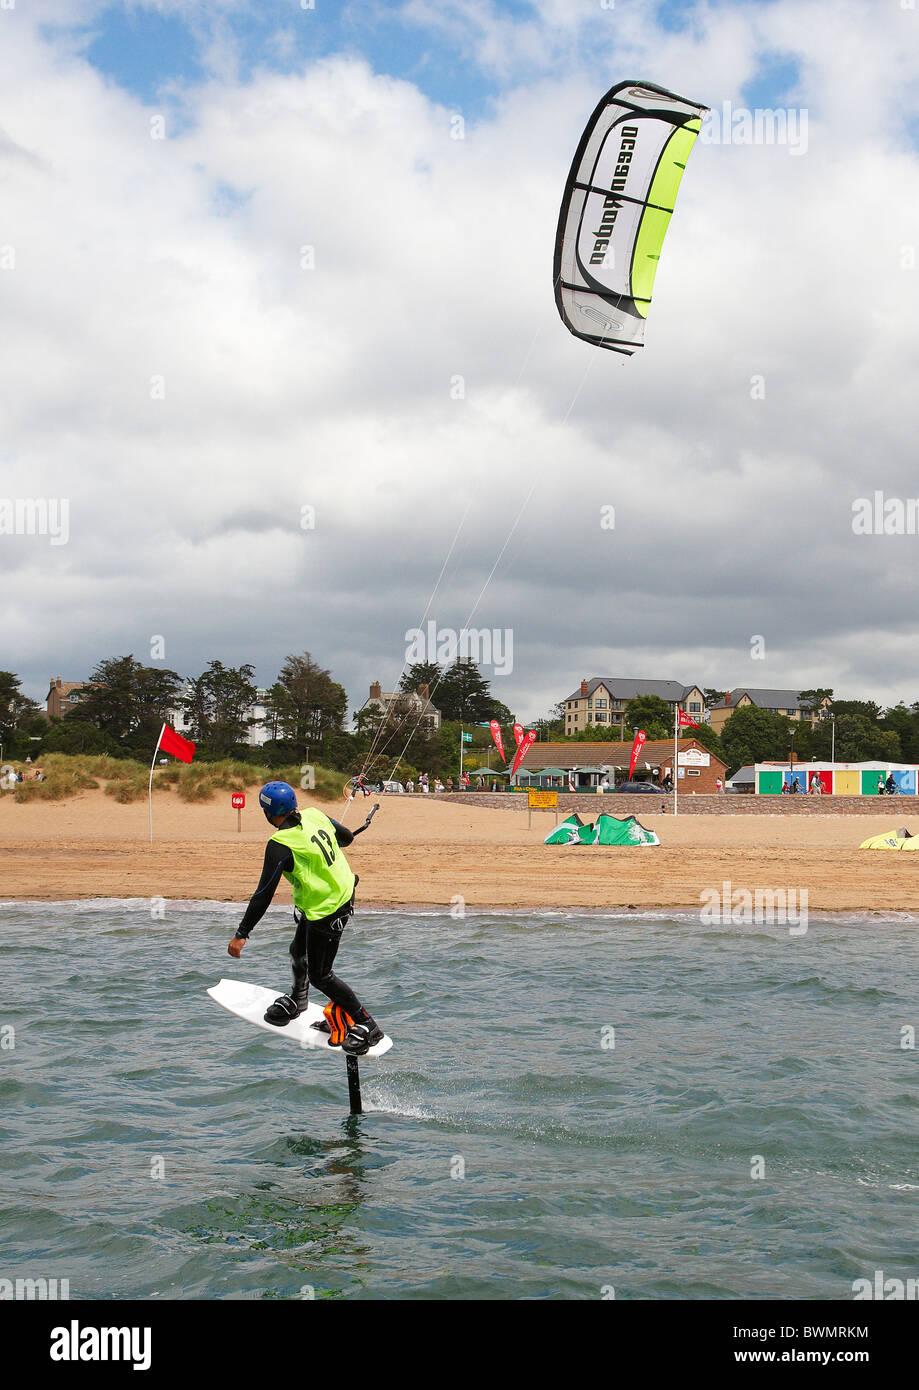 Kitesurfing on the river Exe estuary, Exmouth, Devon, England, UK - Stock Image